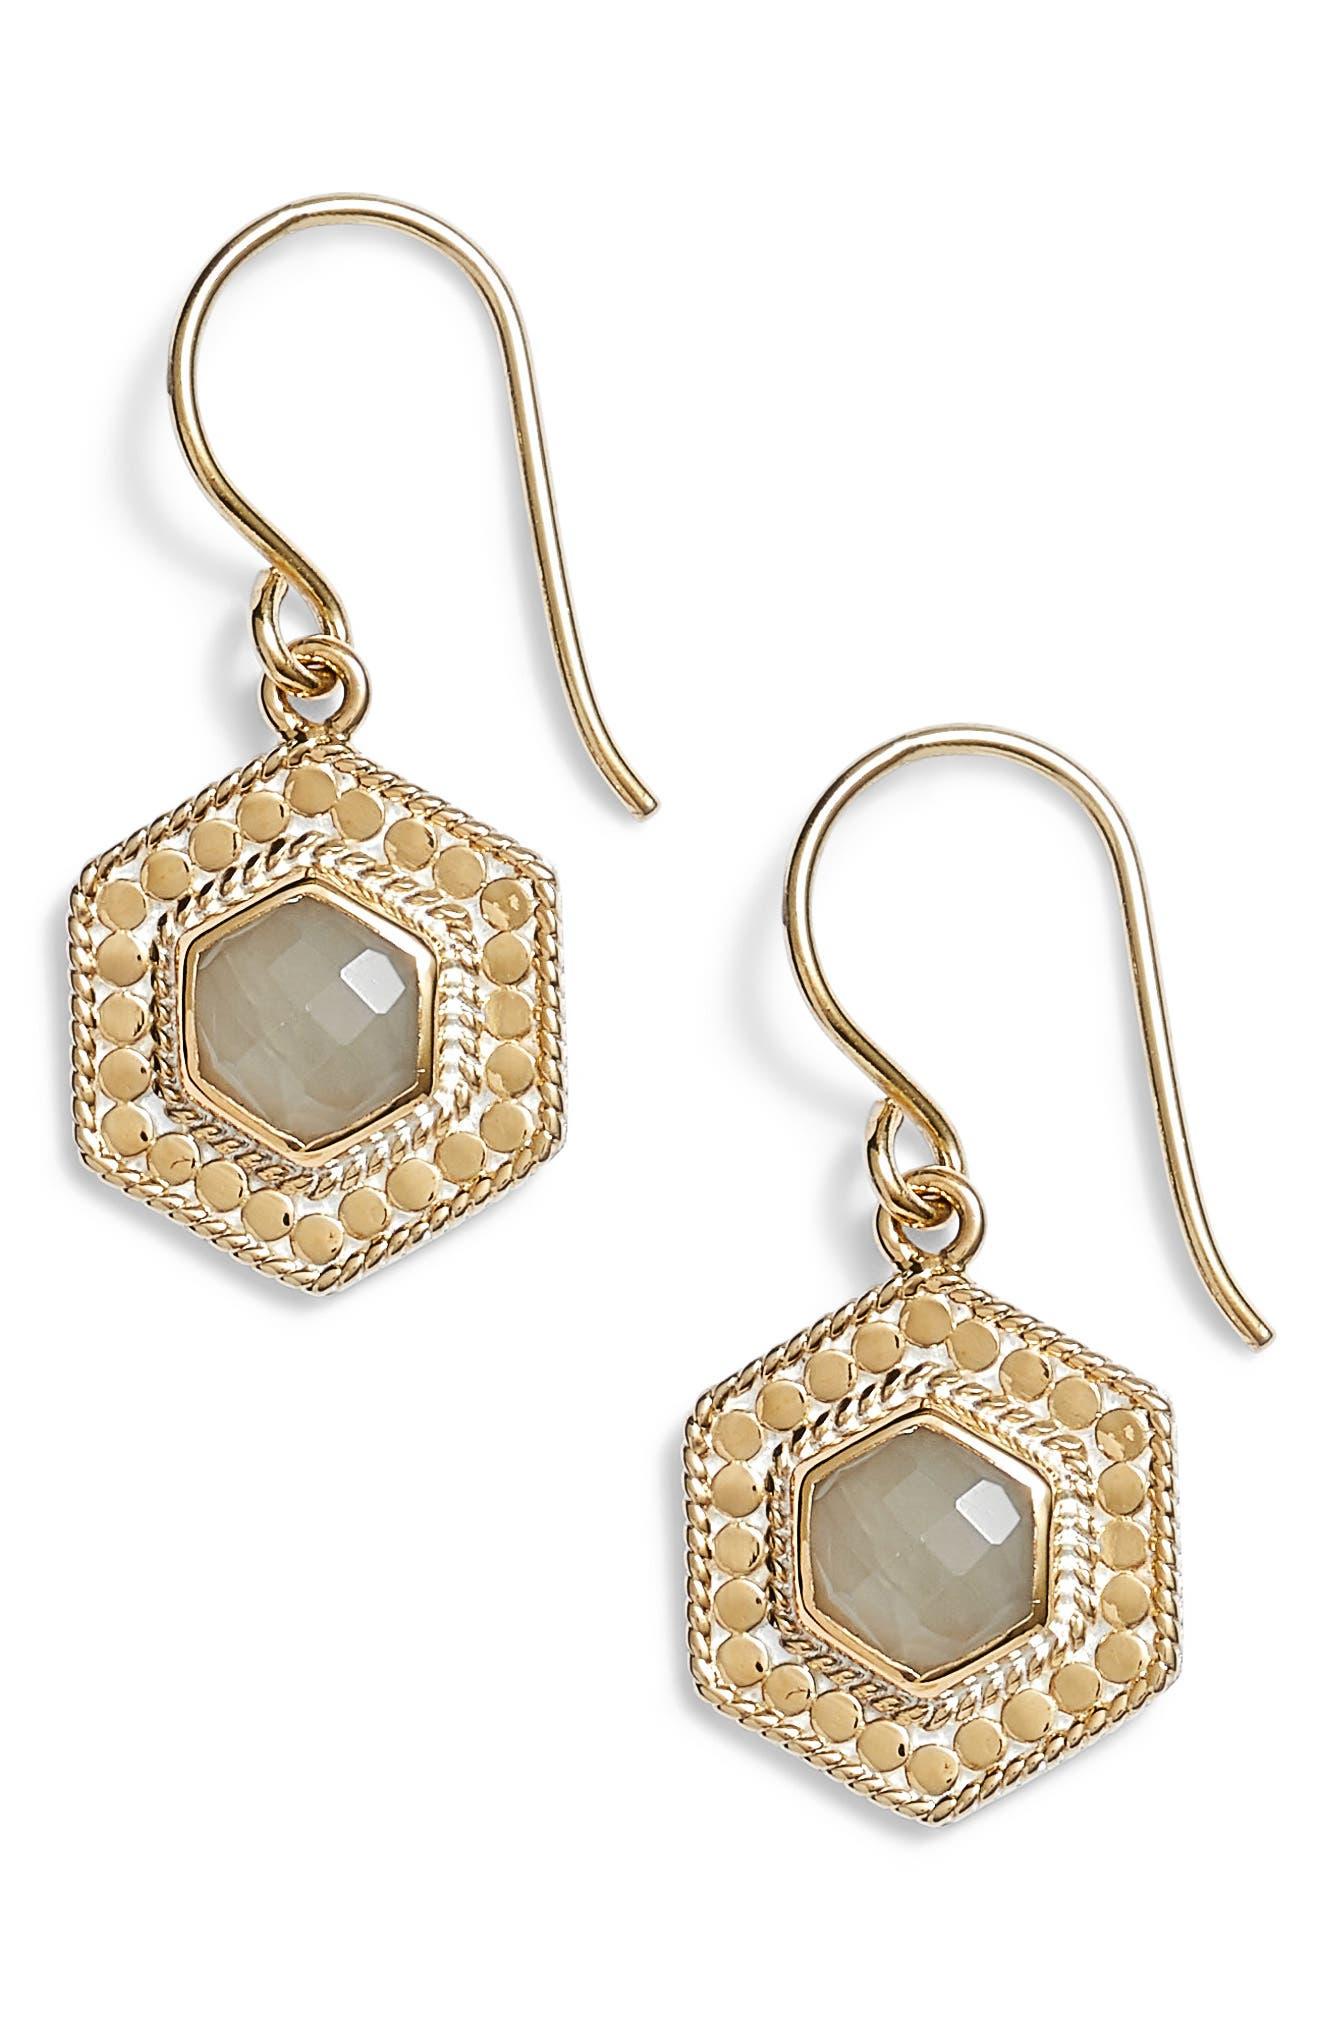 Grey Moonstone Hexagon Drop Earrings,                             Main thumbnail 1, color,                             Gold/ Grey Moonstone